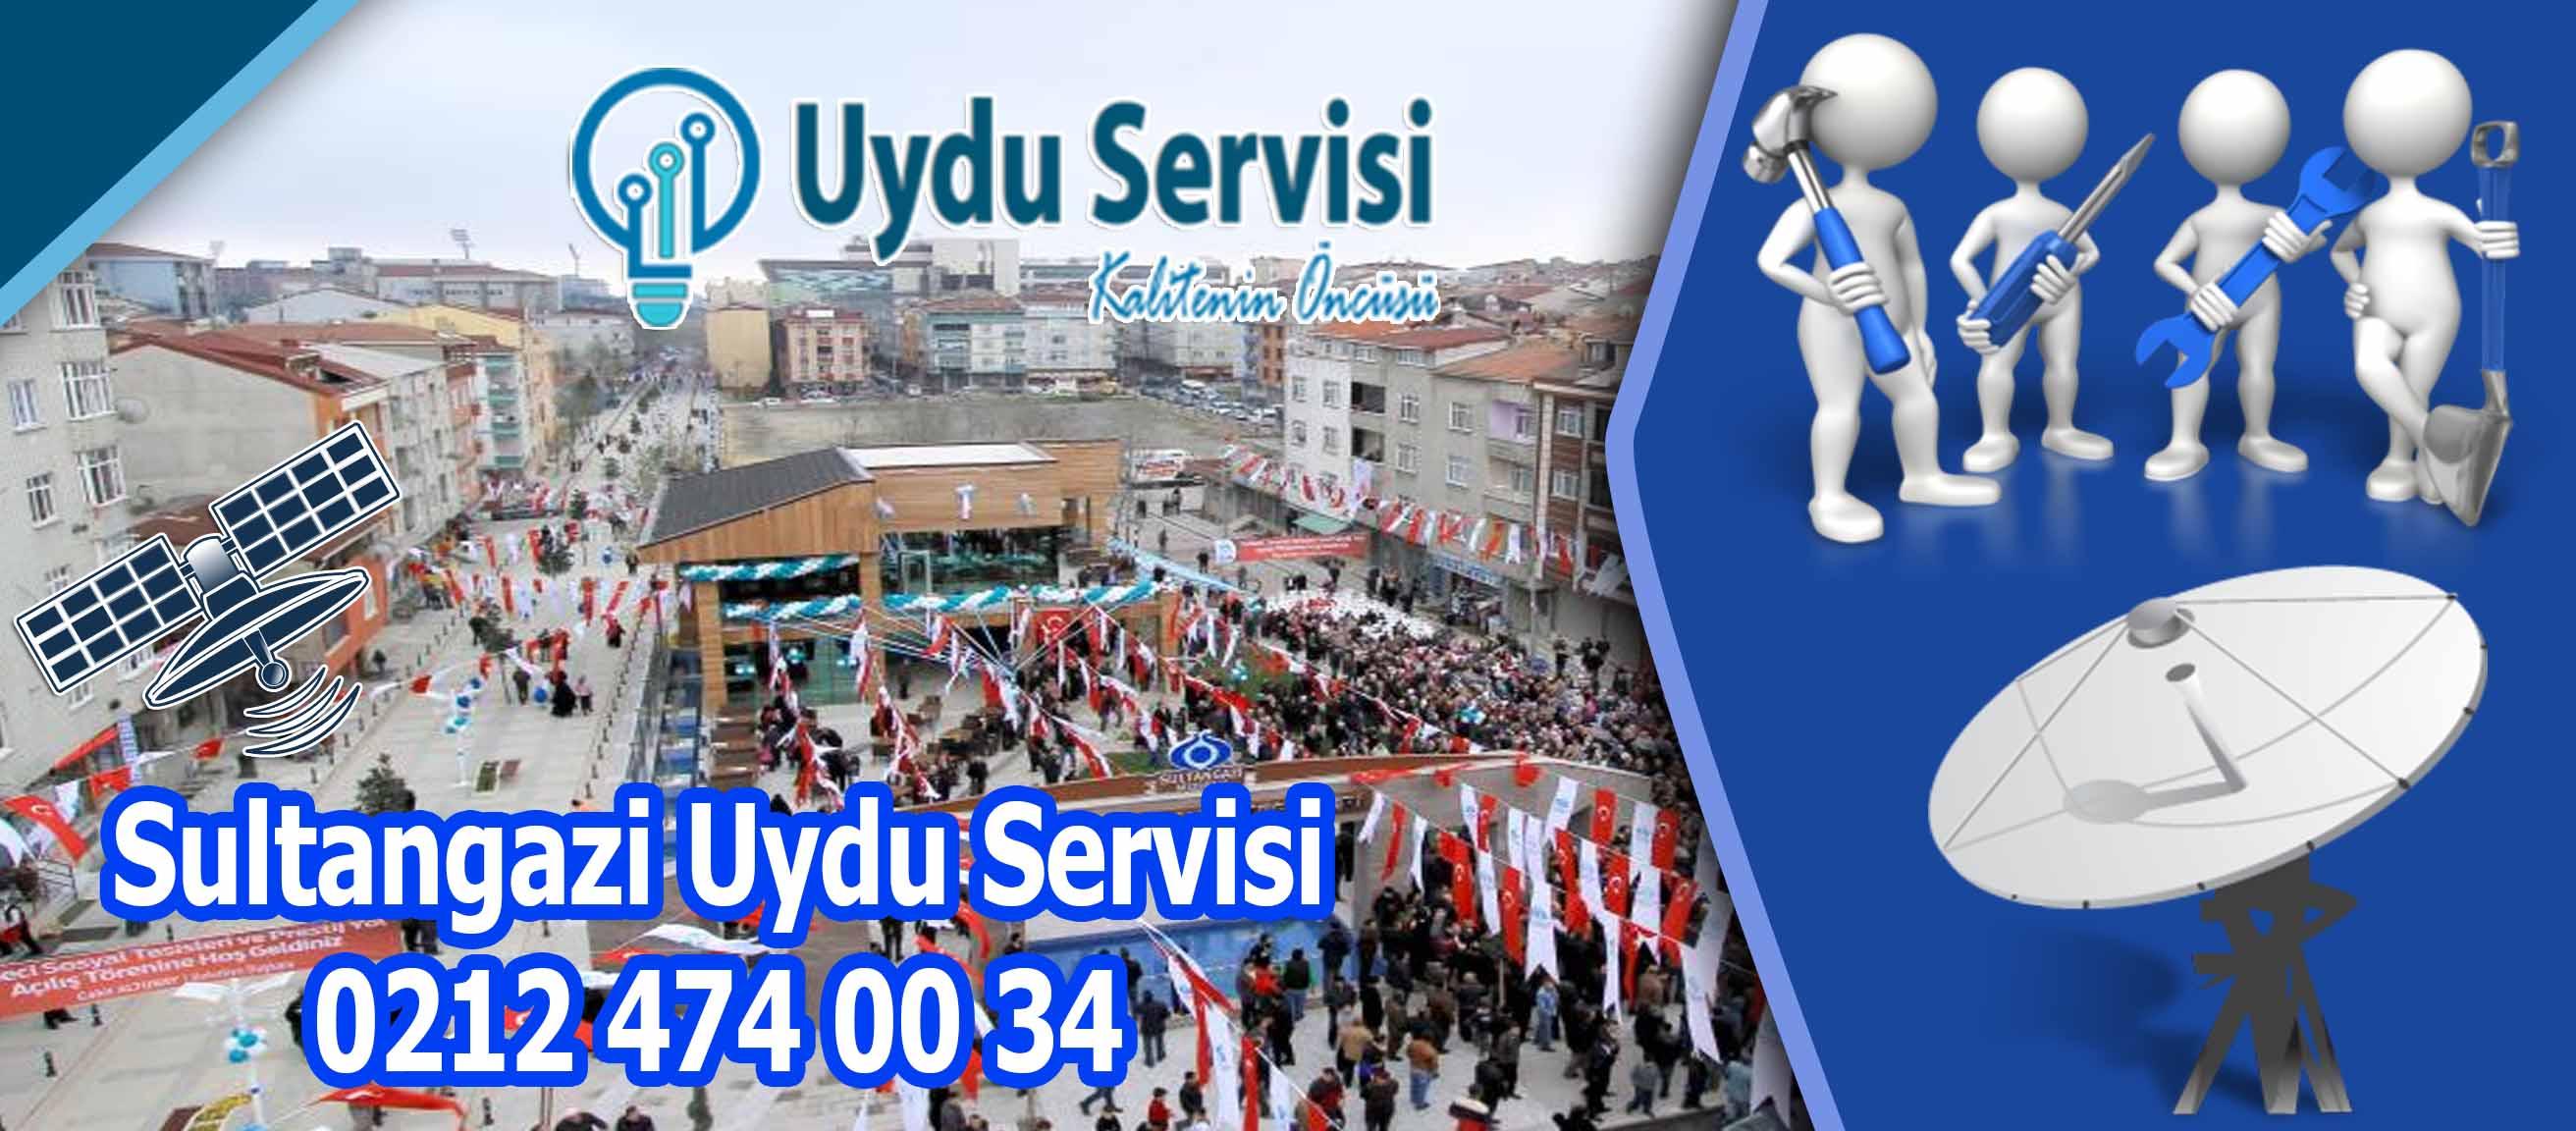 Sultangazi Uydu Servisi